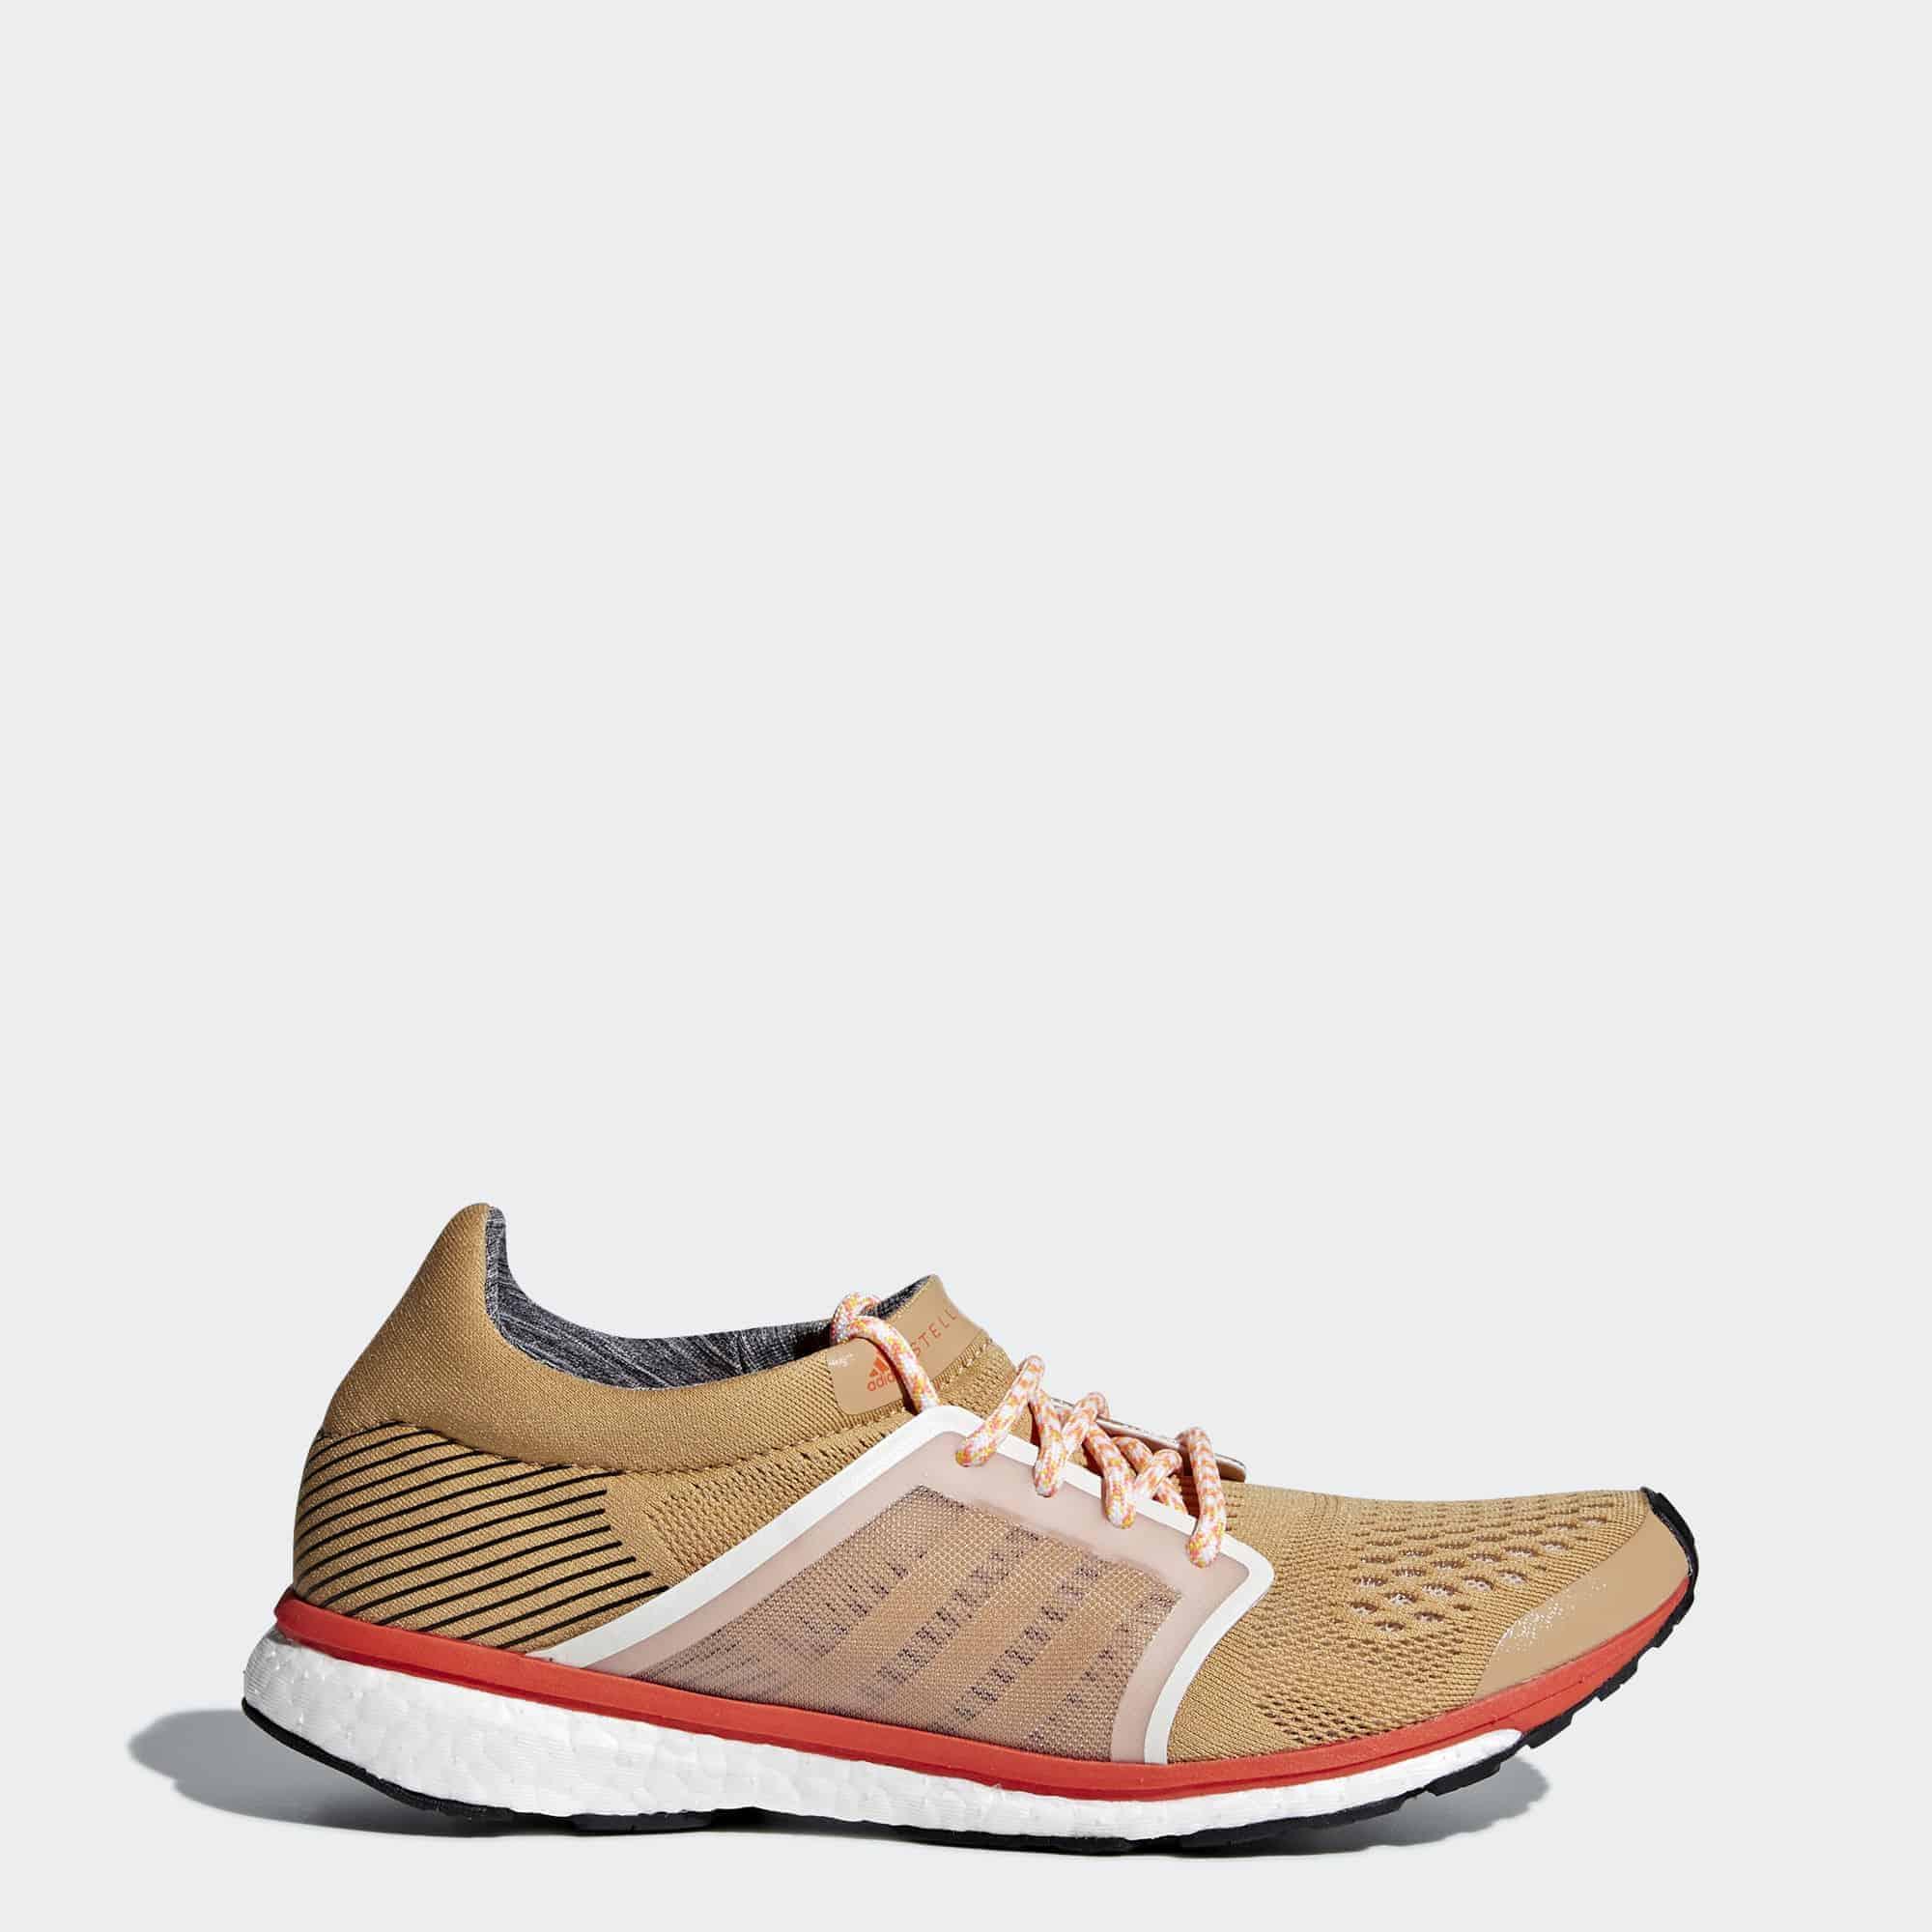 Кроссовки для бега Adidas Adizero Adios by Stella McCartney женские